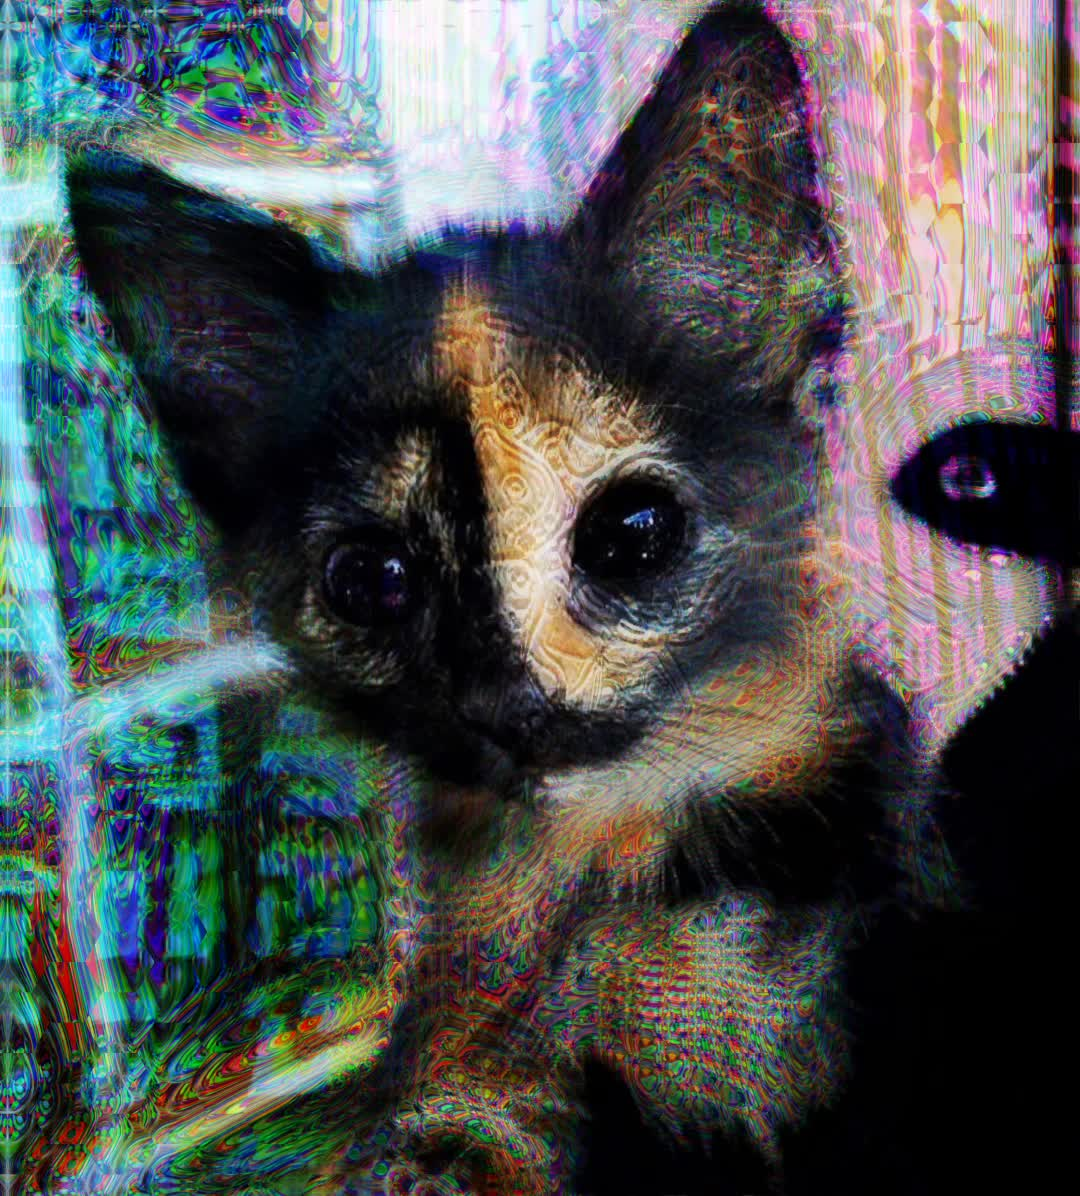 acid trip, dmt trip, dmt visuals, psychedelic, psychedelic replication, psychedelic trip, psychedelic trip visuals, psychedelic visuals, psychedelics, Sub-breakthrough DMT Kitty GIFs